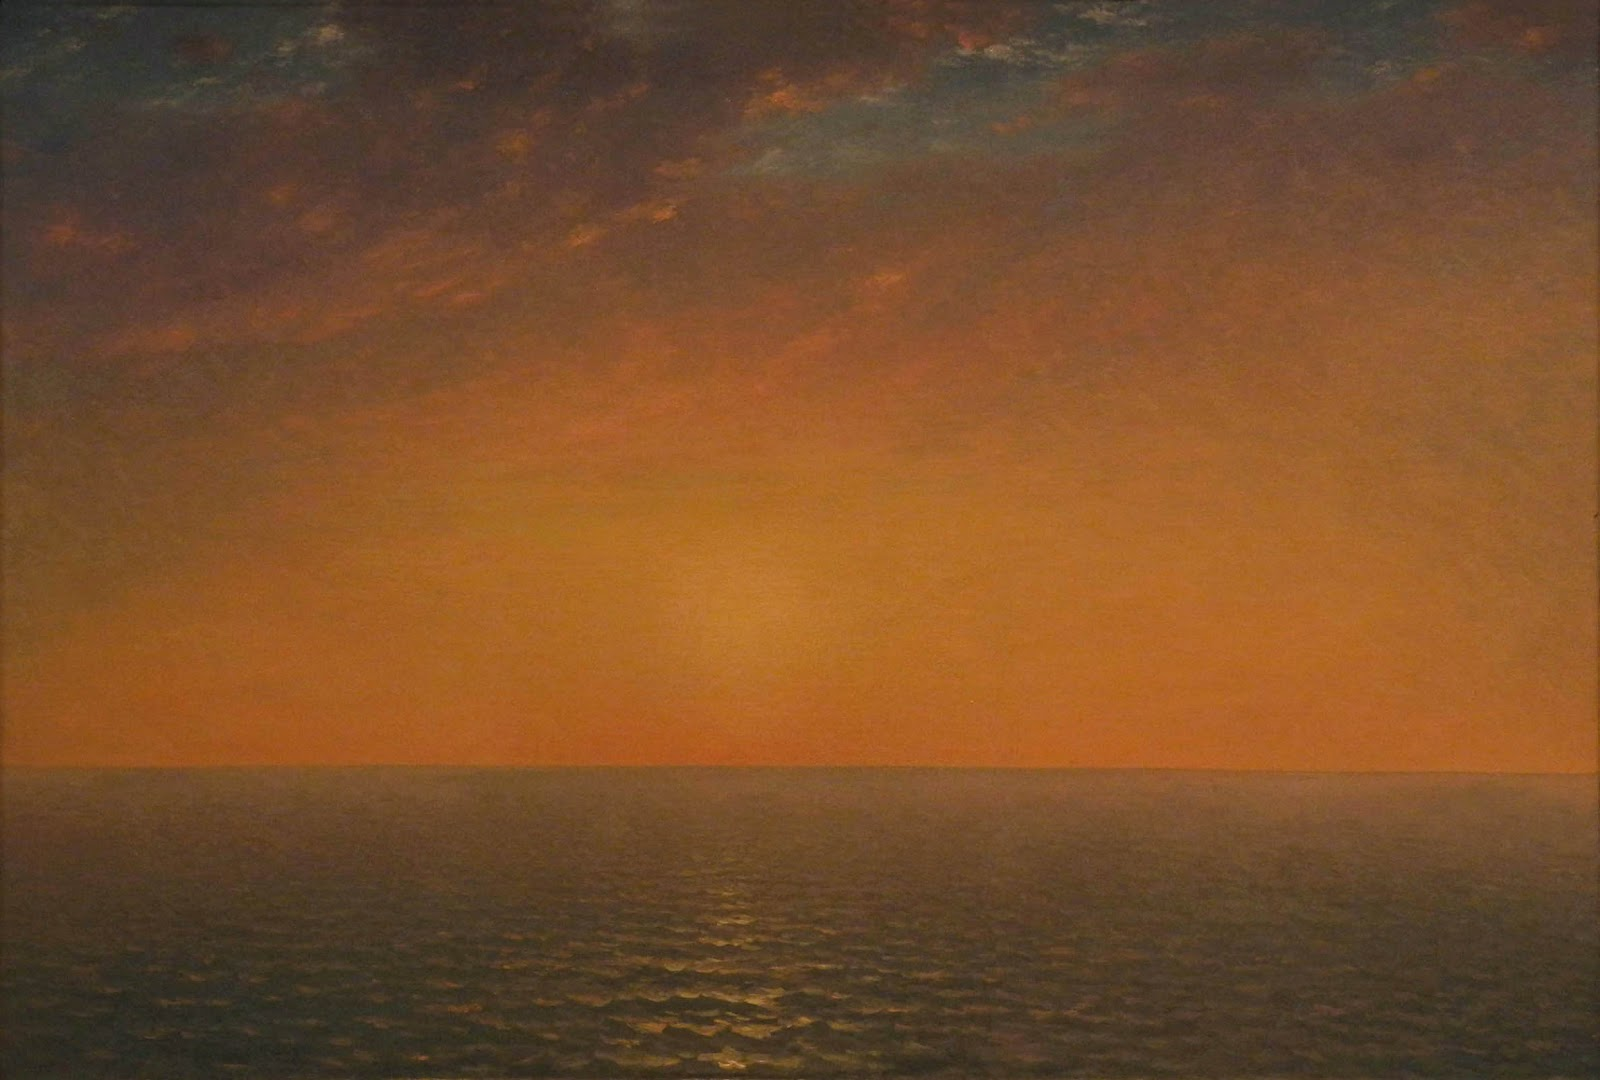 John Frederick Kensett, Sunset on the Sea, 1872, oil on canvas, 28 x 41 1/8 inch